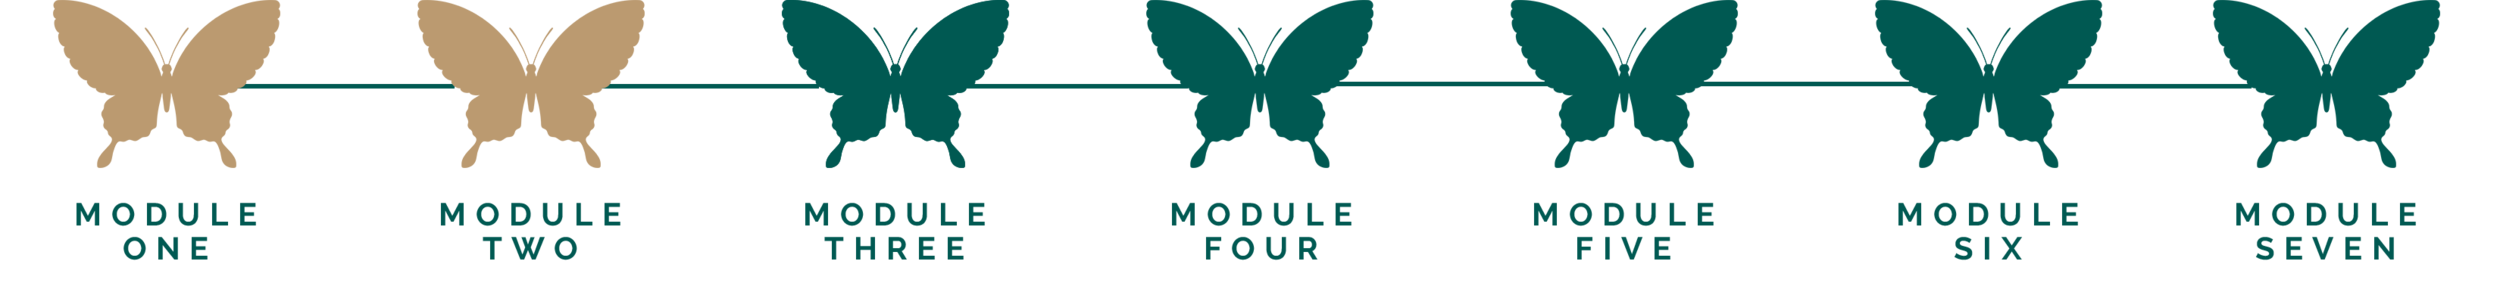 Module 2.7.png